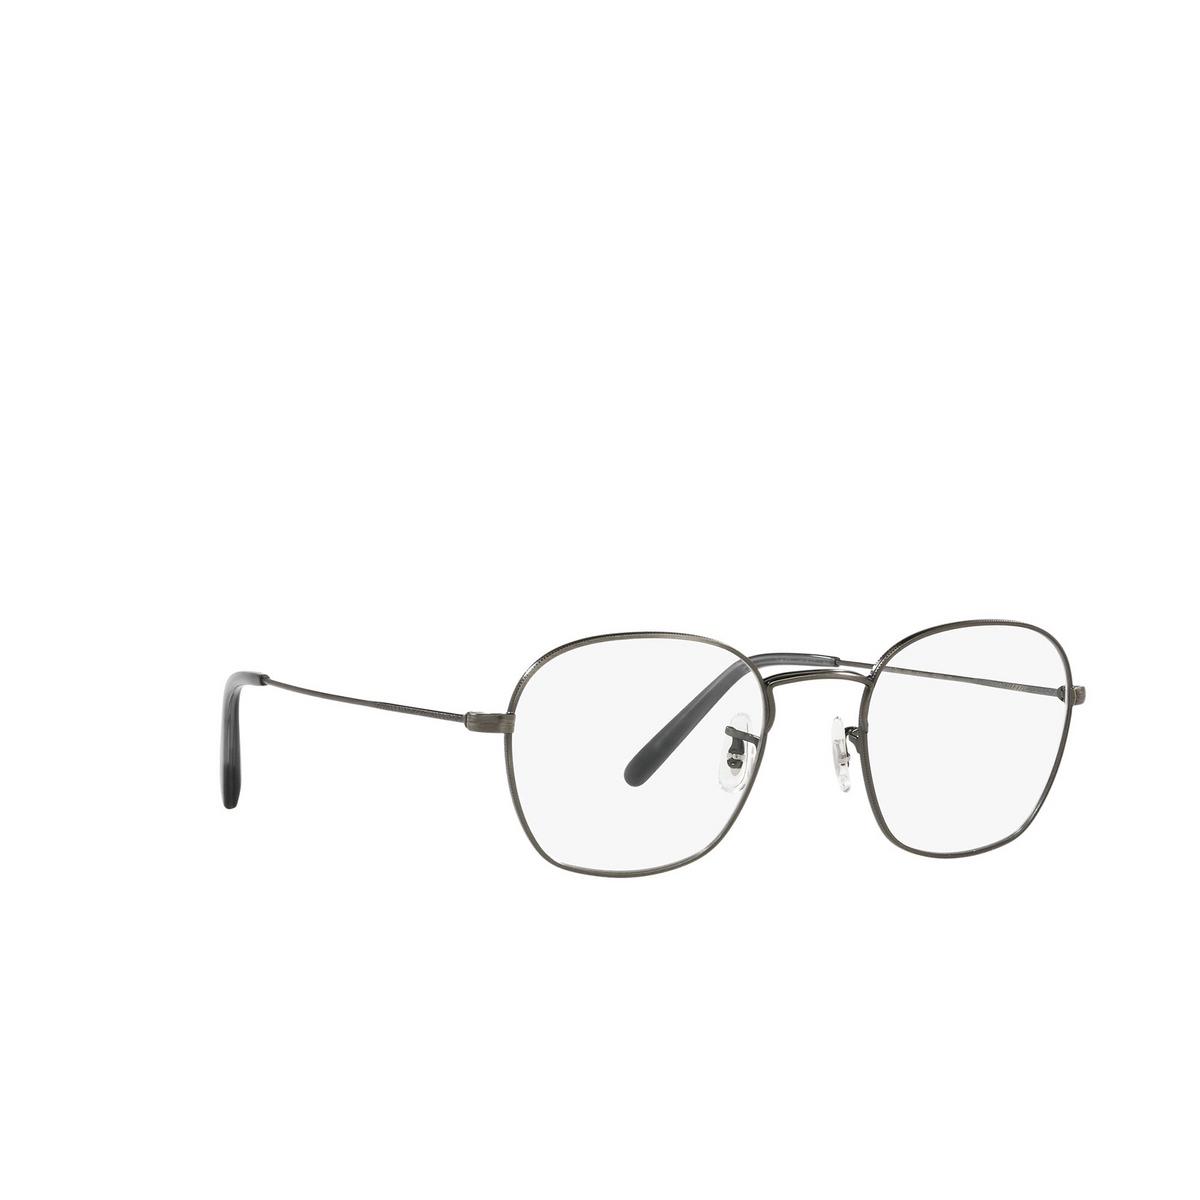 Oliver Peoples® Round Eyeglasses: Allinger OV1284 color Antique Pewter 5289 - three-quarters view.